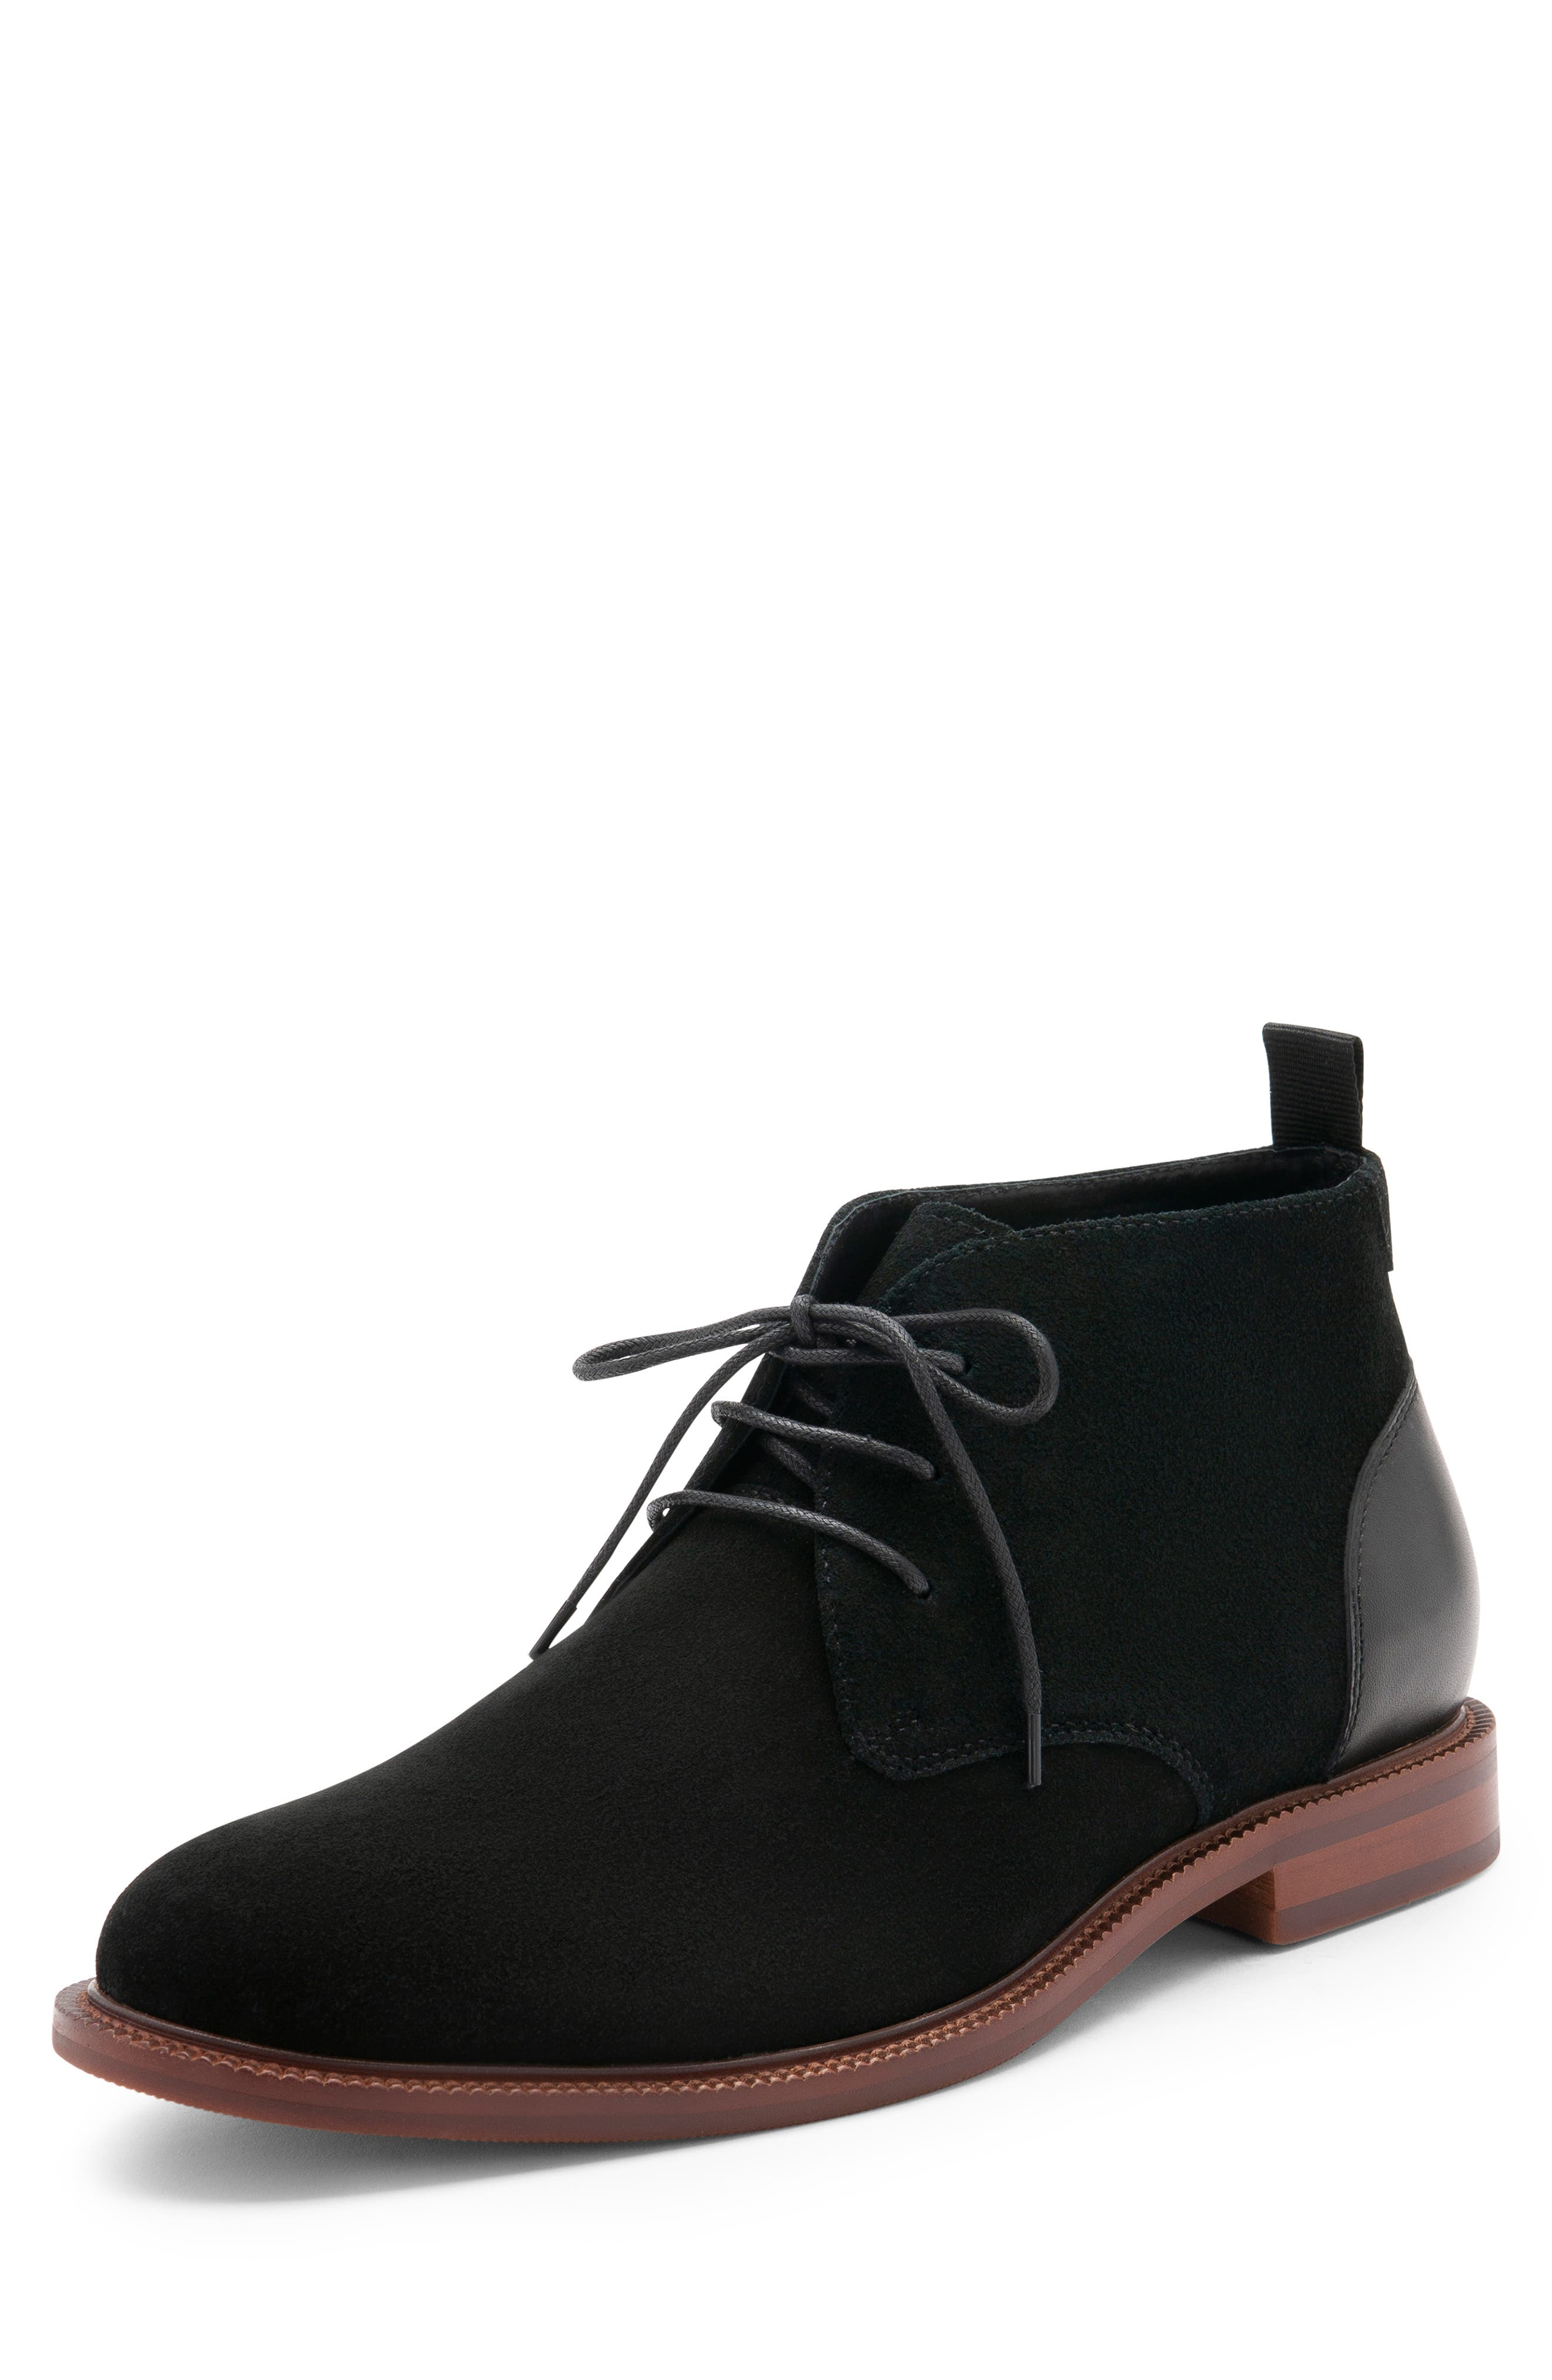 Keith Waterproof Chukka Boot,                             Alternate thumbnail 7, color,                             BLACK SUEDE